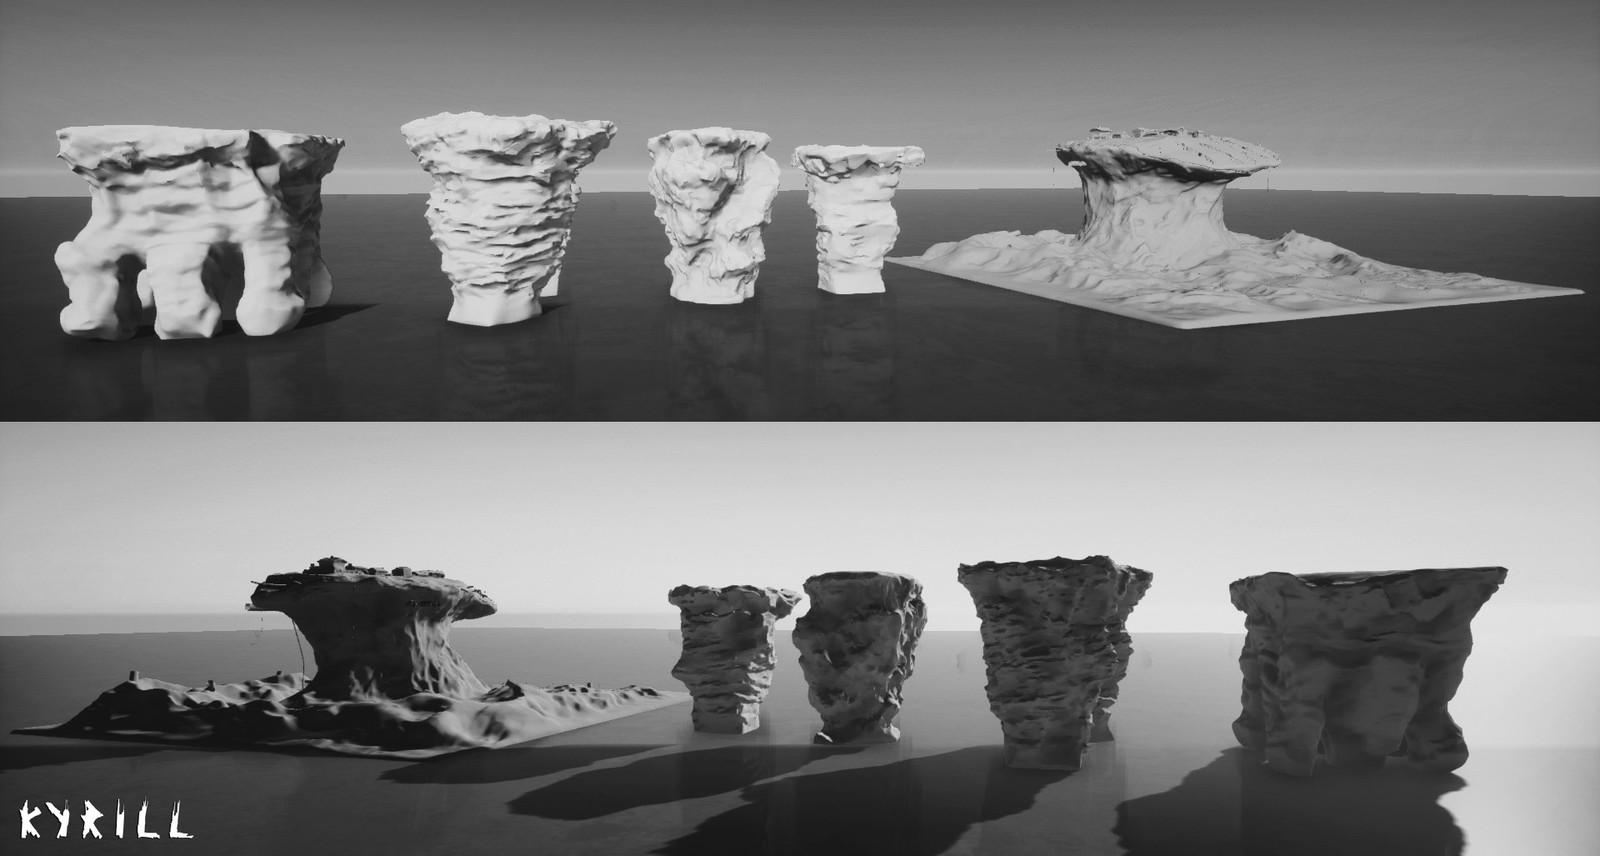 Rock models for the island set.